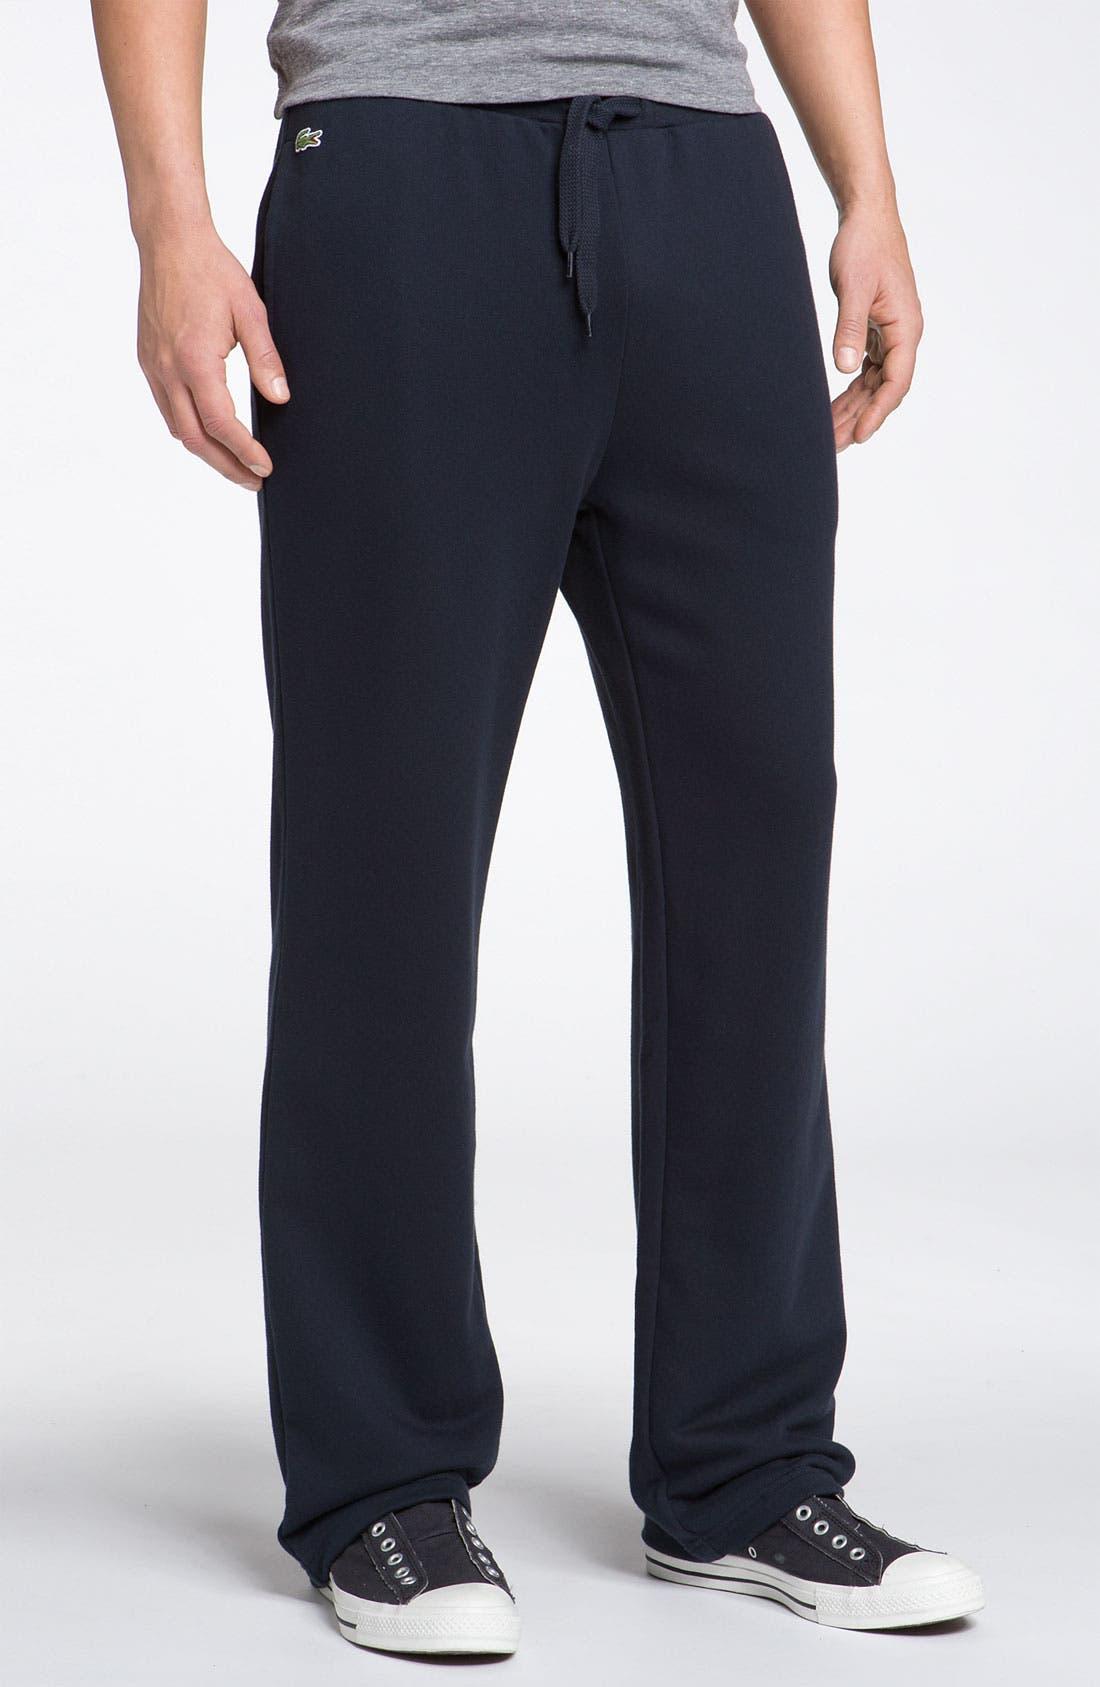 Main Image - Lacoste Fleece Track Pants